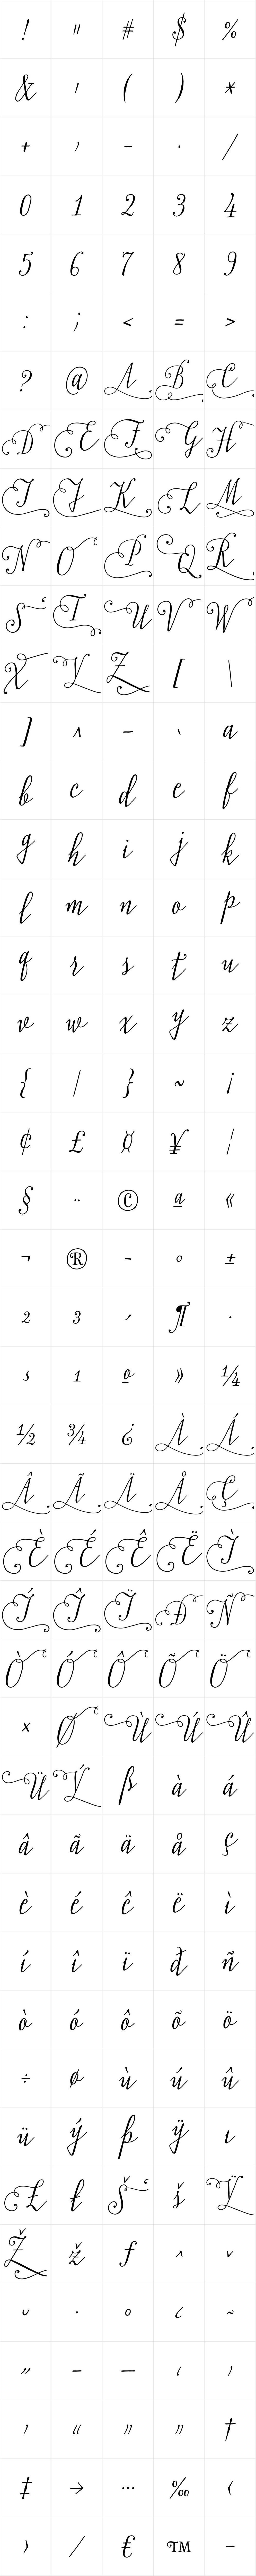 Typnic Script Swash 3